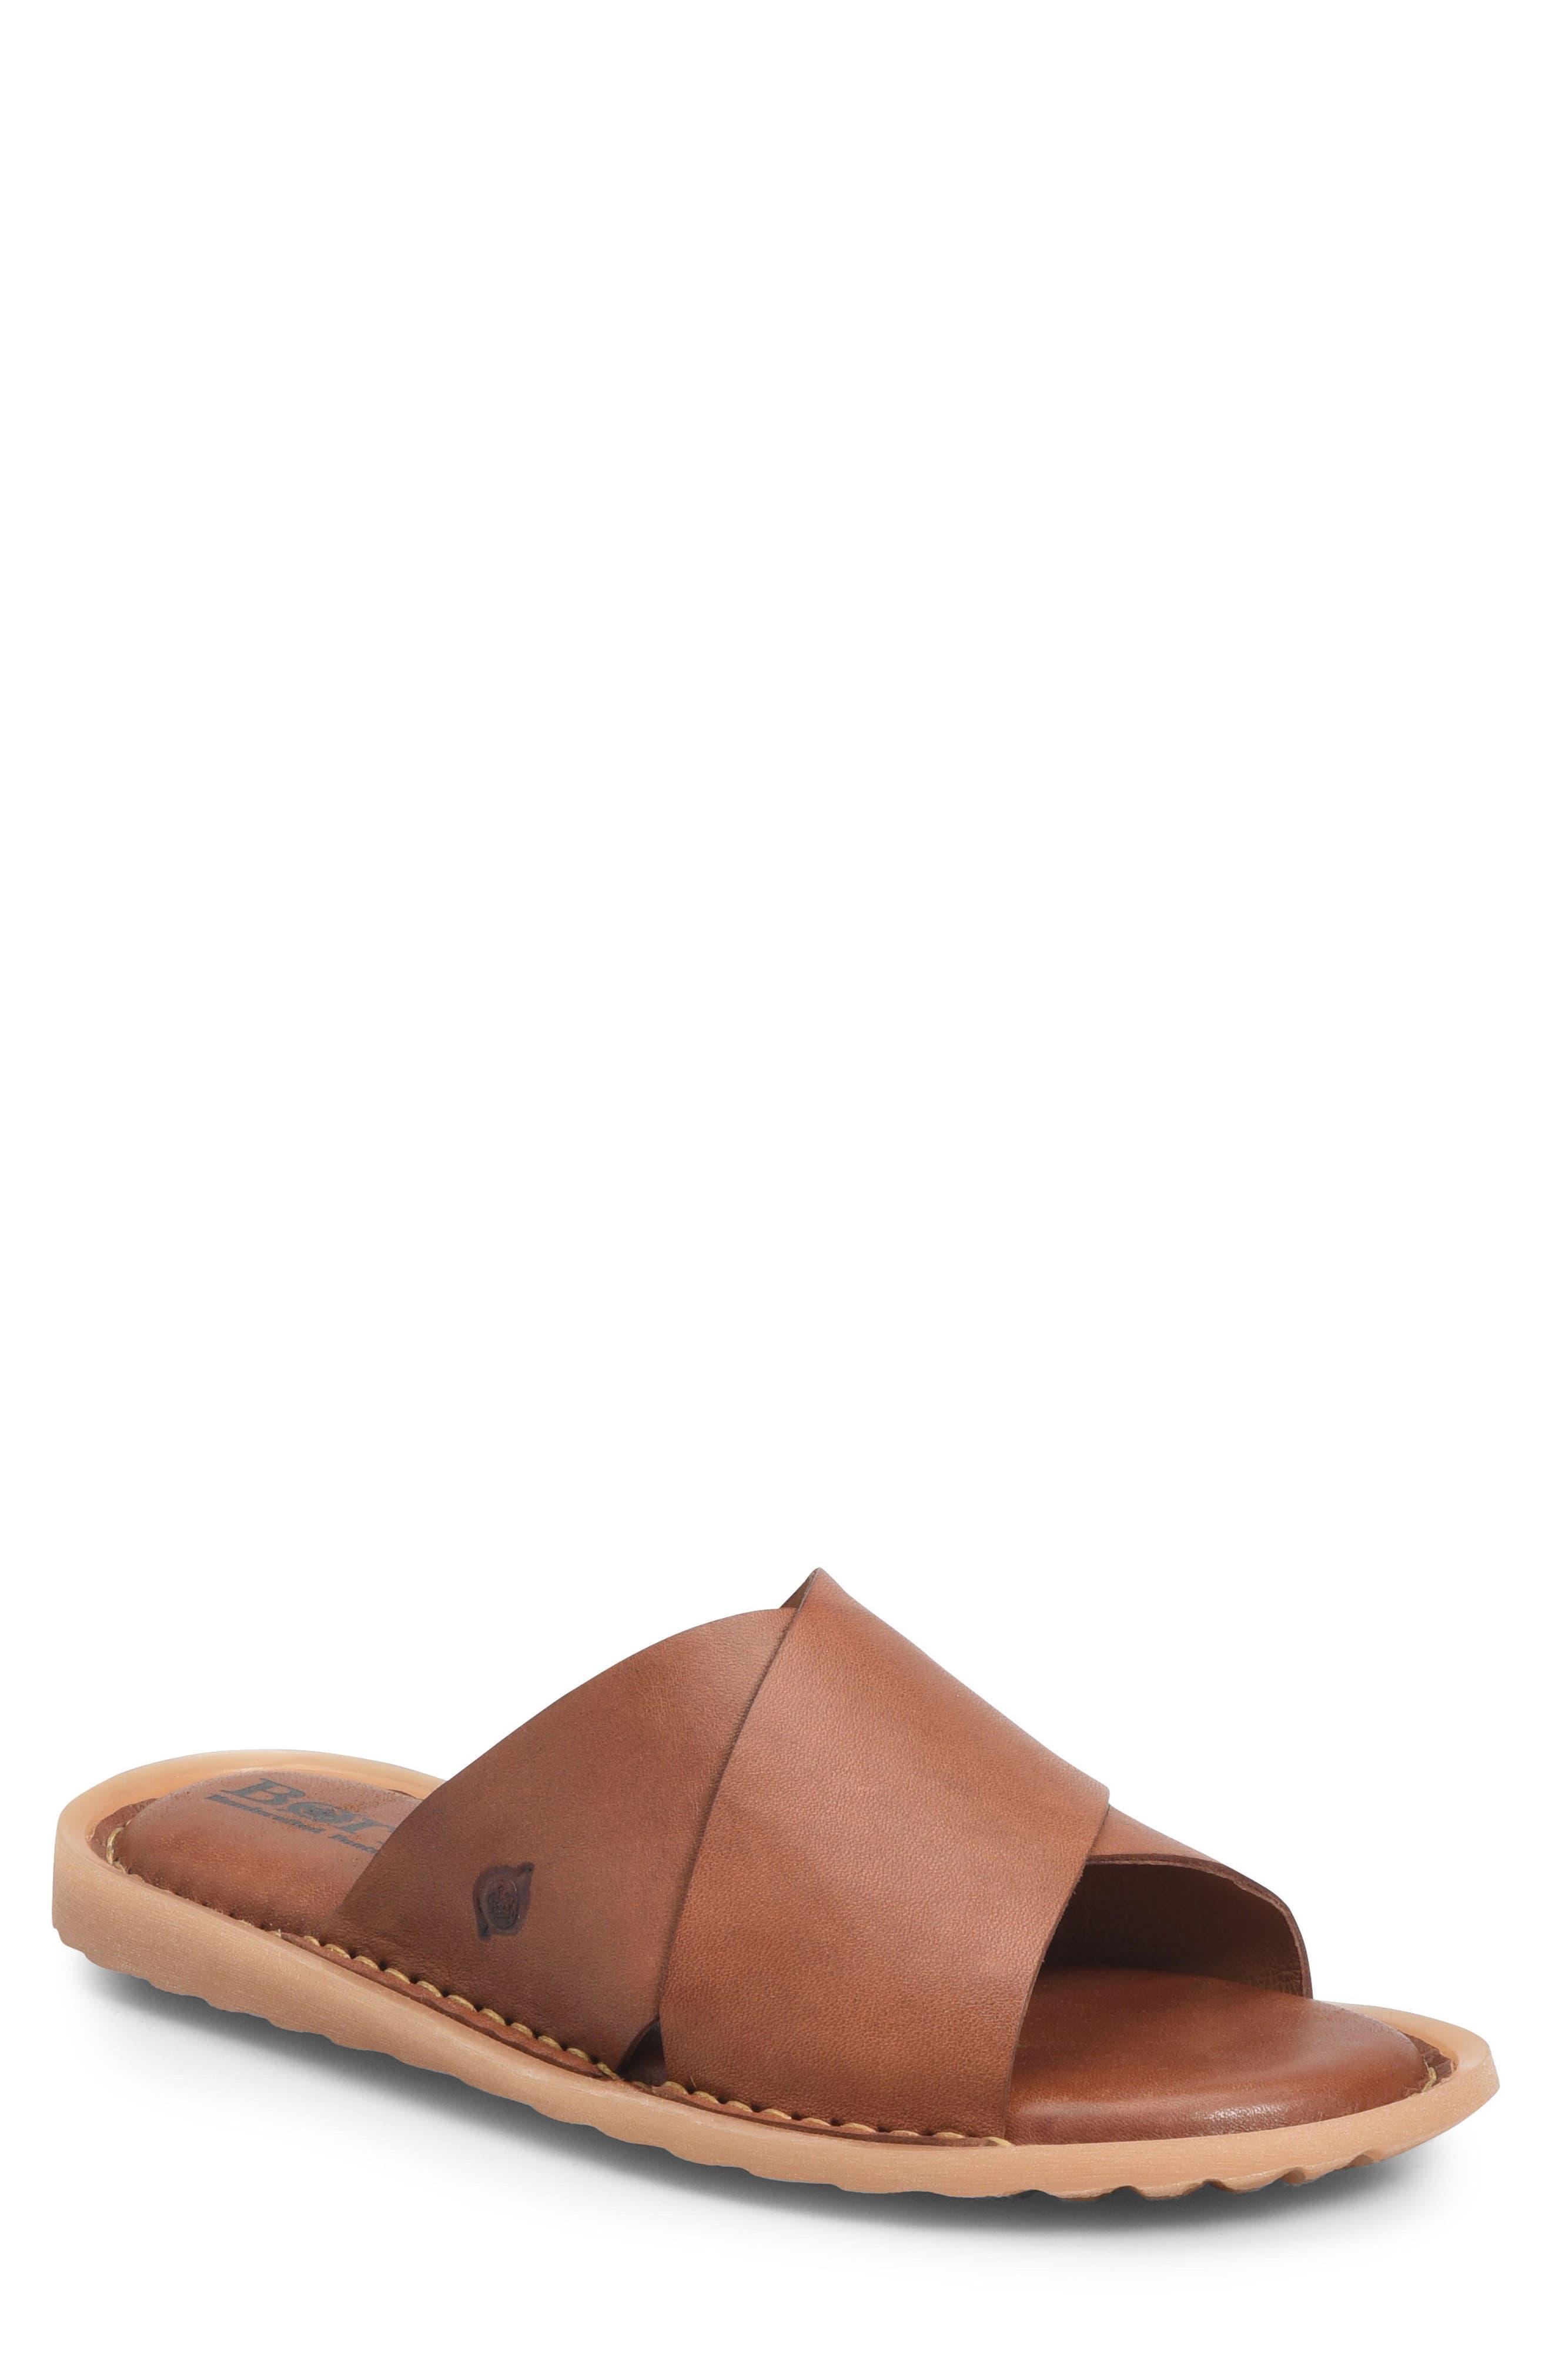 Getaway Slide Sandal,                         Main,                         color, Rust Leather